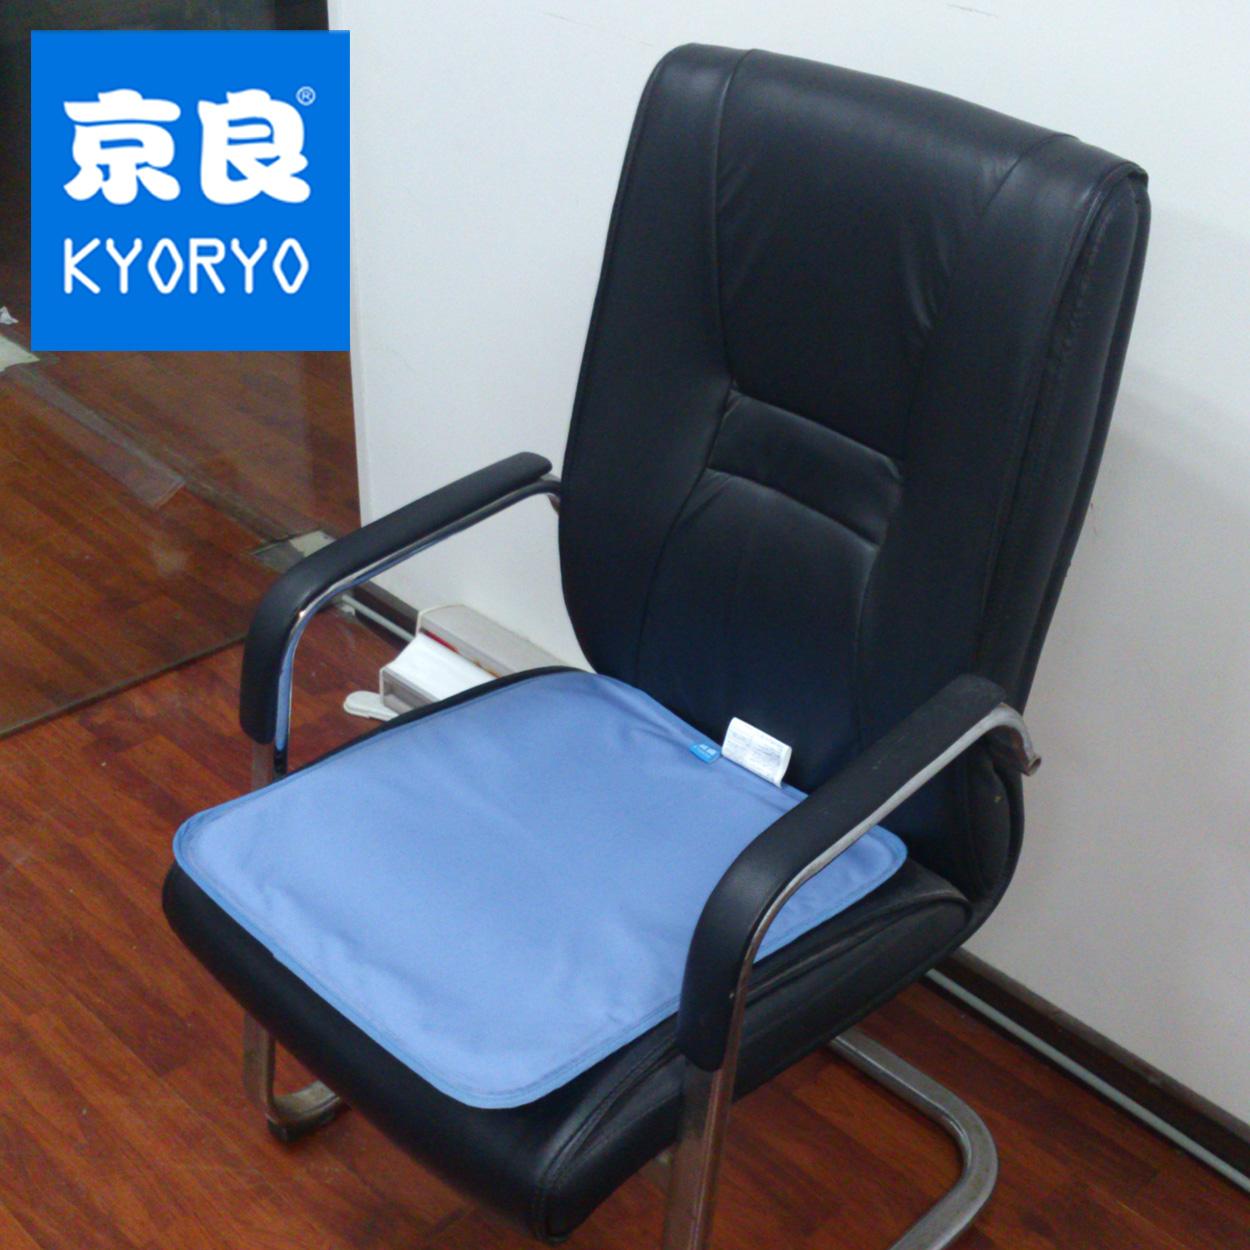 Cool Gel Chair Cushion The 5 Best Gel Seat Cushions Product